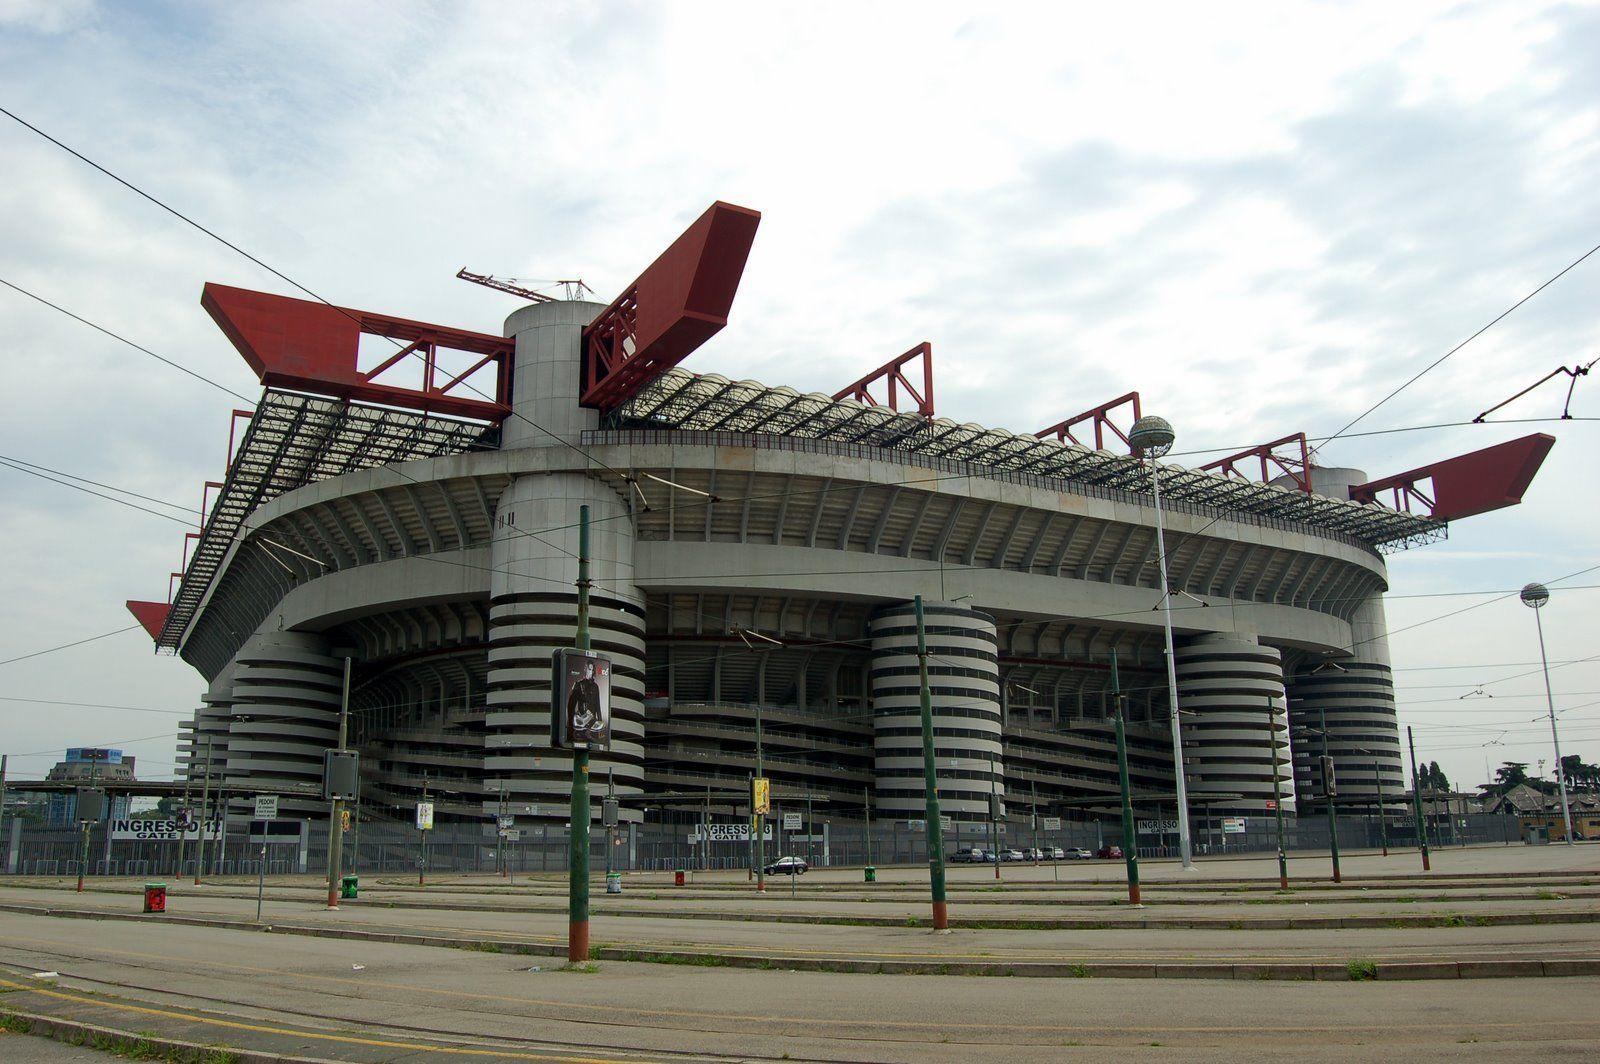 Finale Champions League 2016 a San Siro a Milano